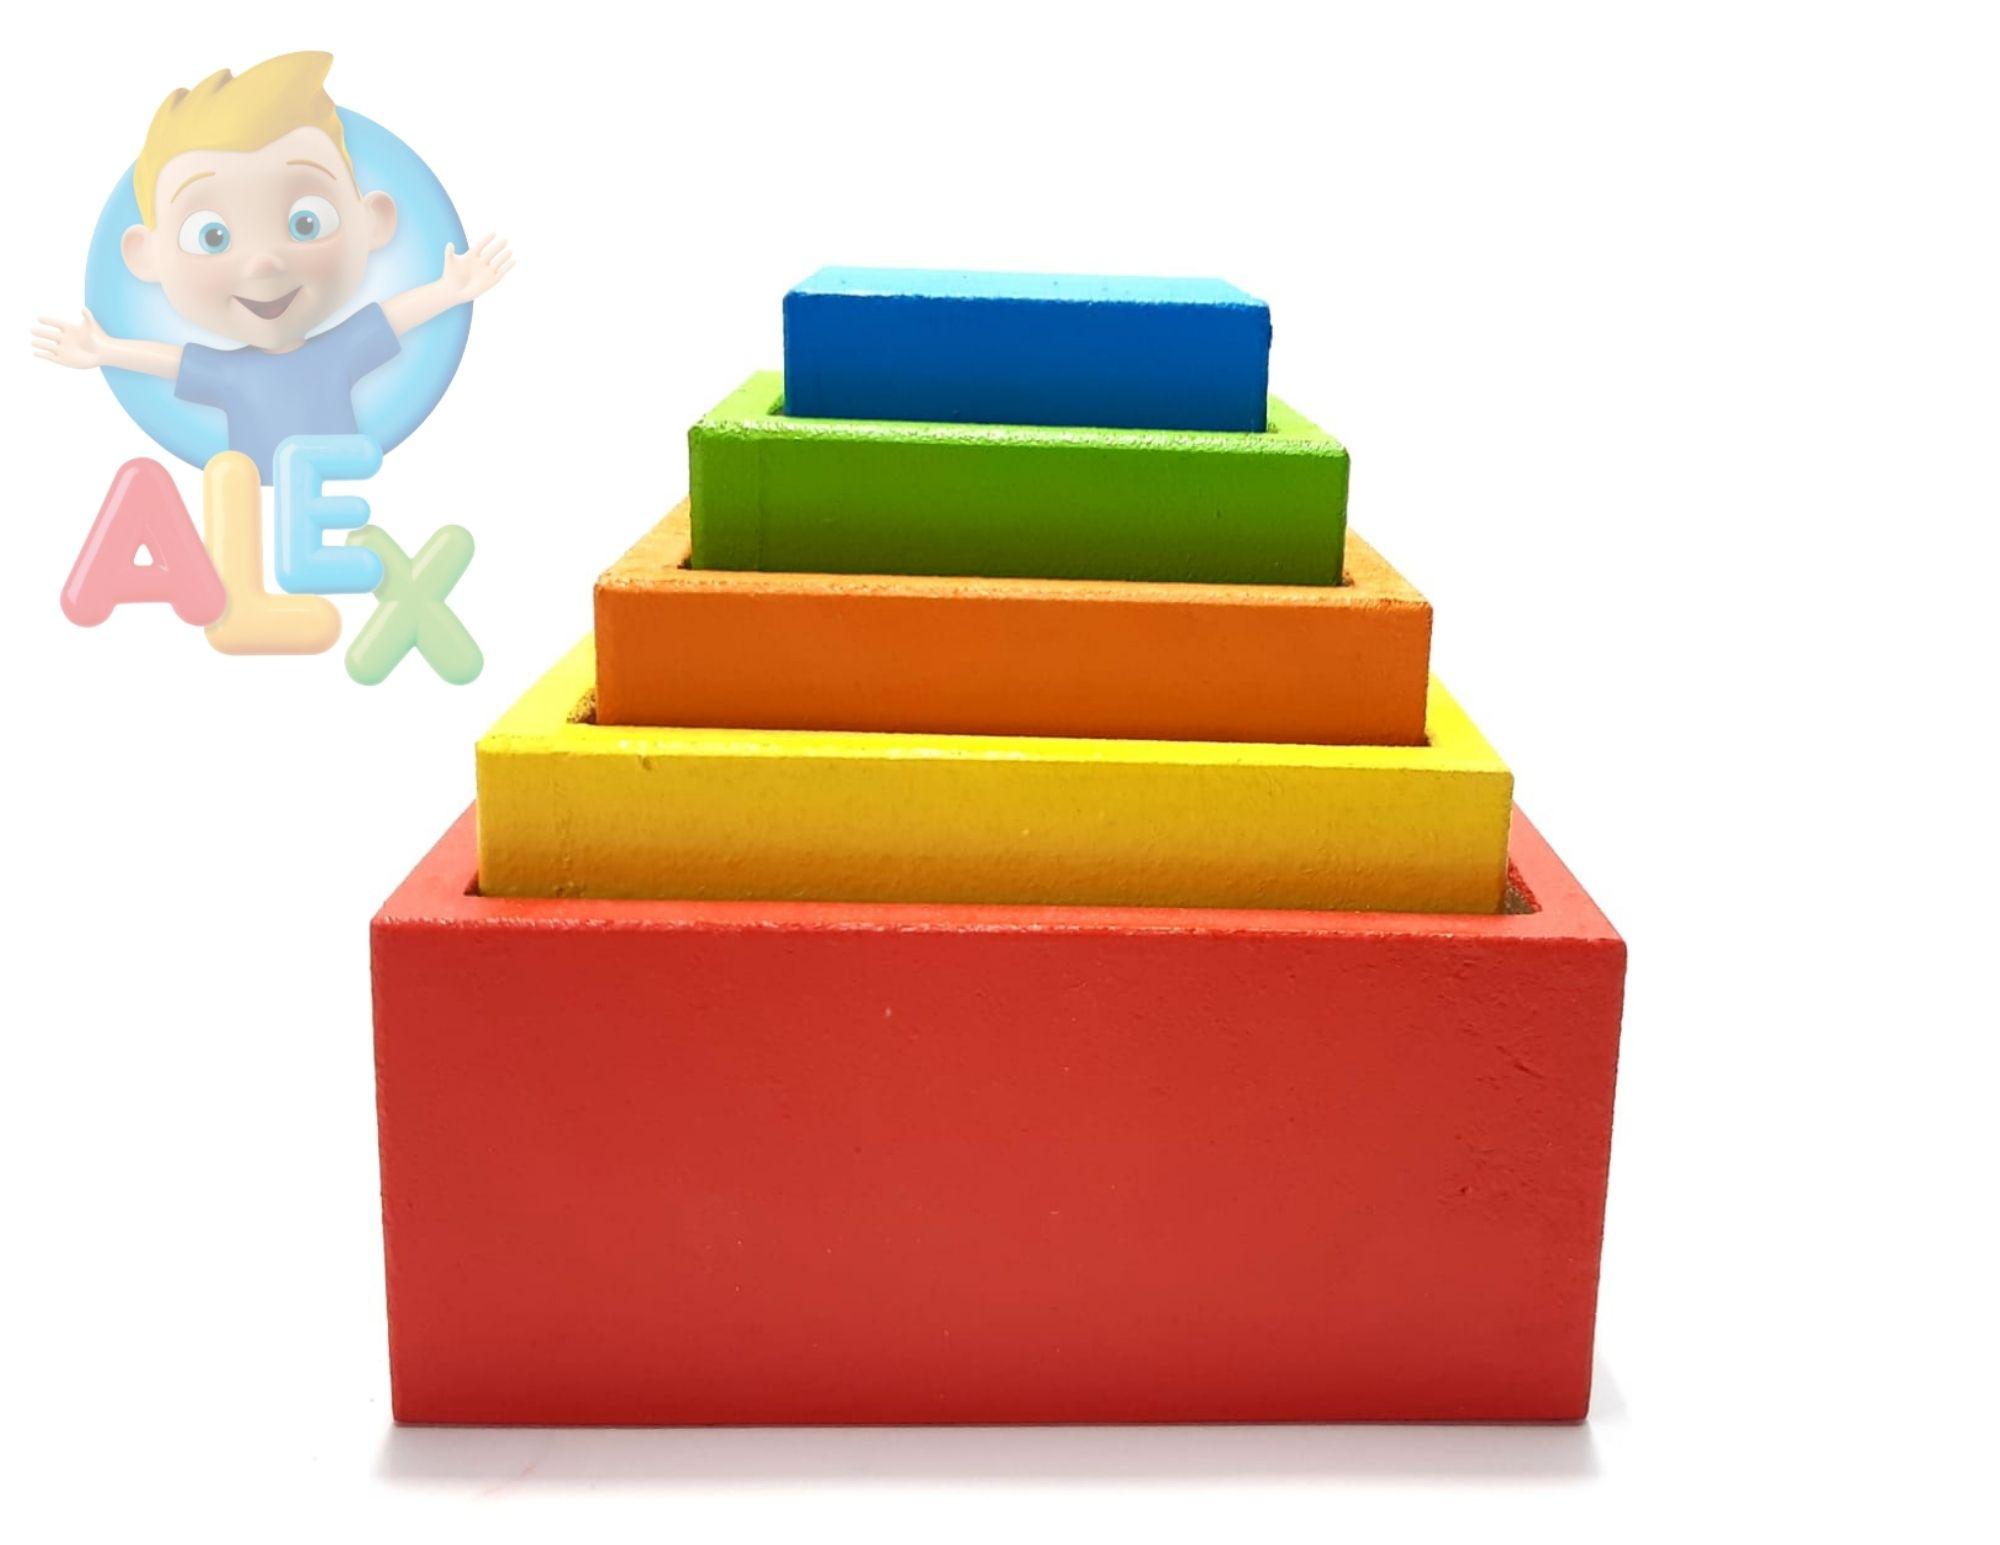 Cubo De Encaixe - Estimula Psicomotricidade Dos Bebês